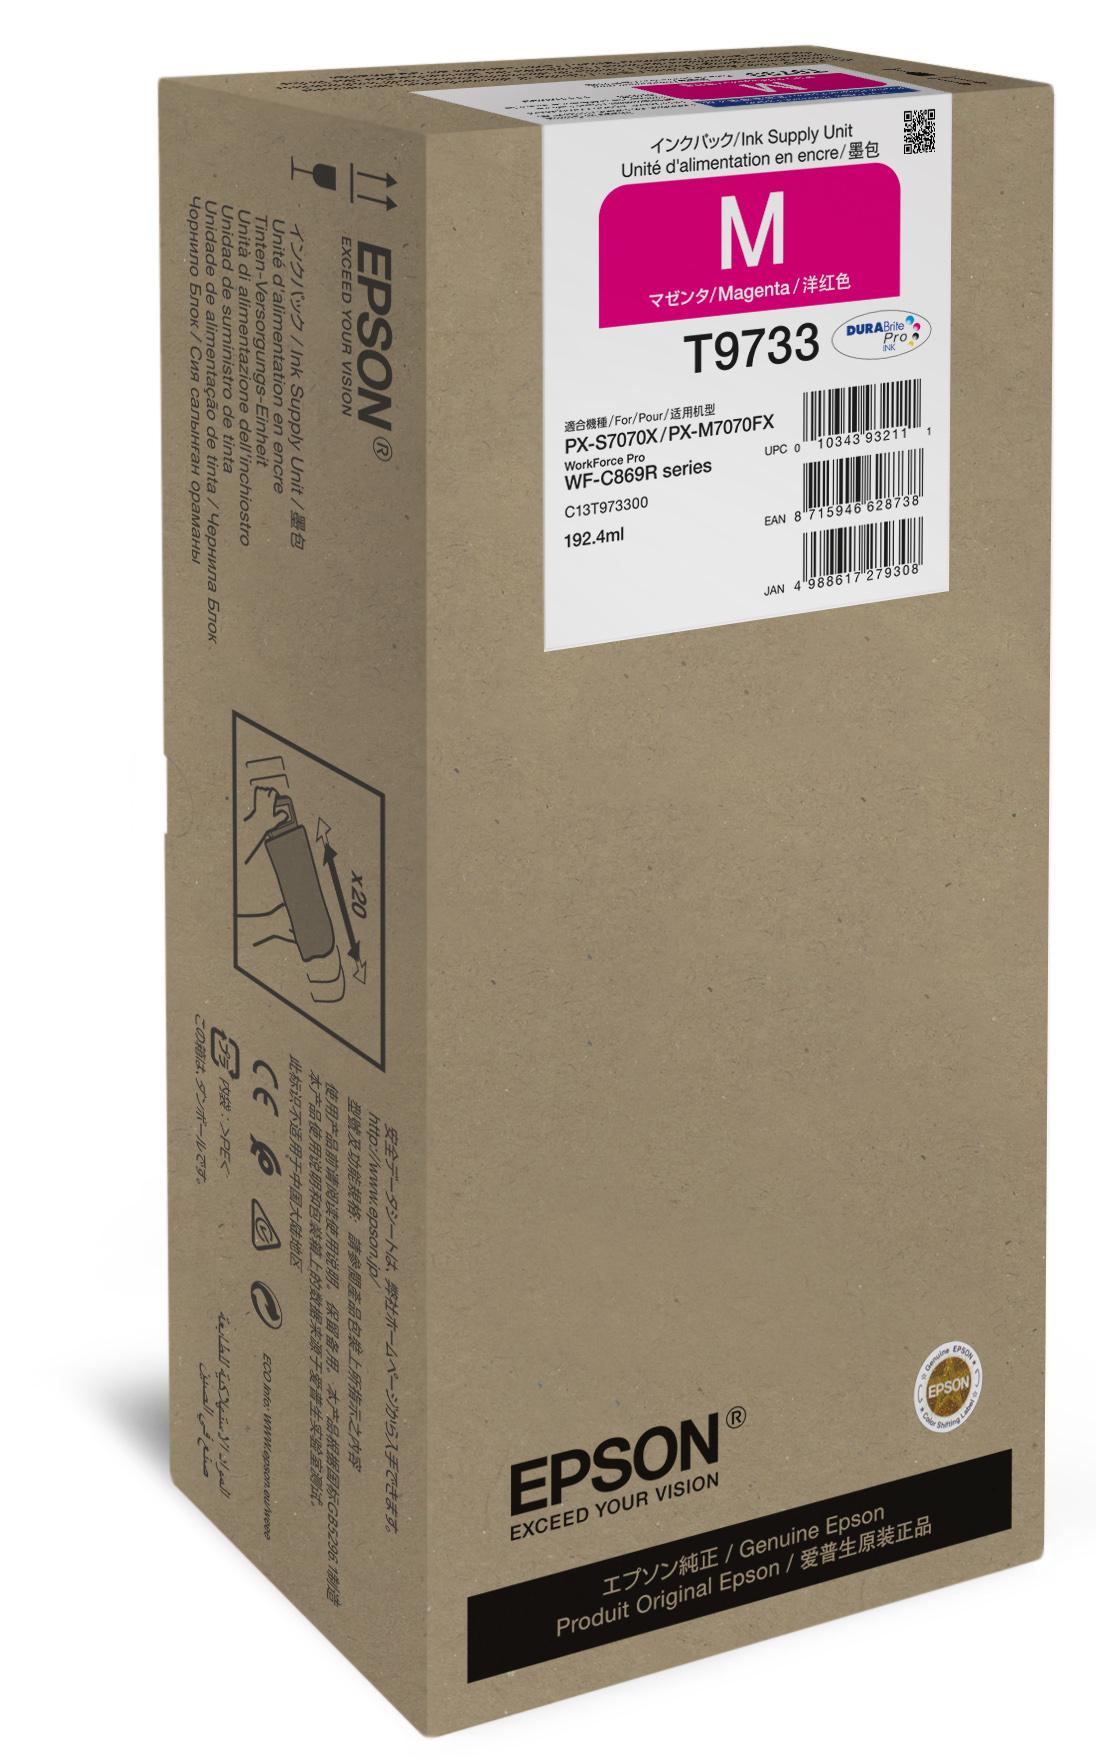 Epson Magenta XL Ink Supply Unit